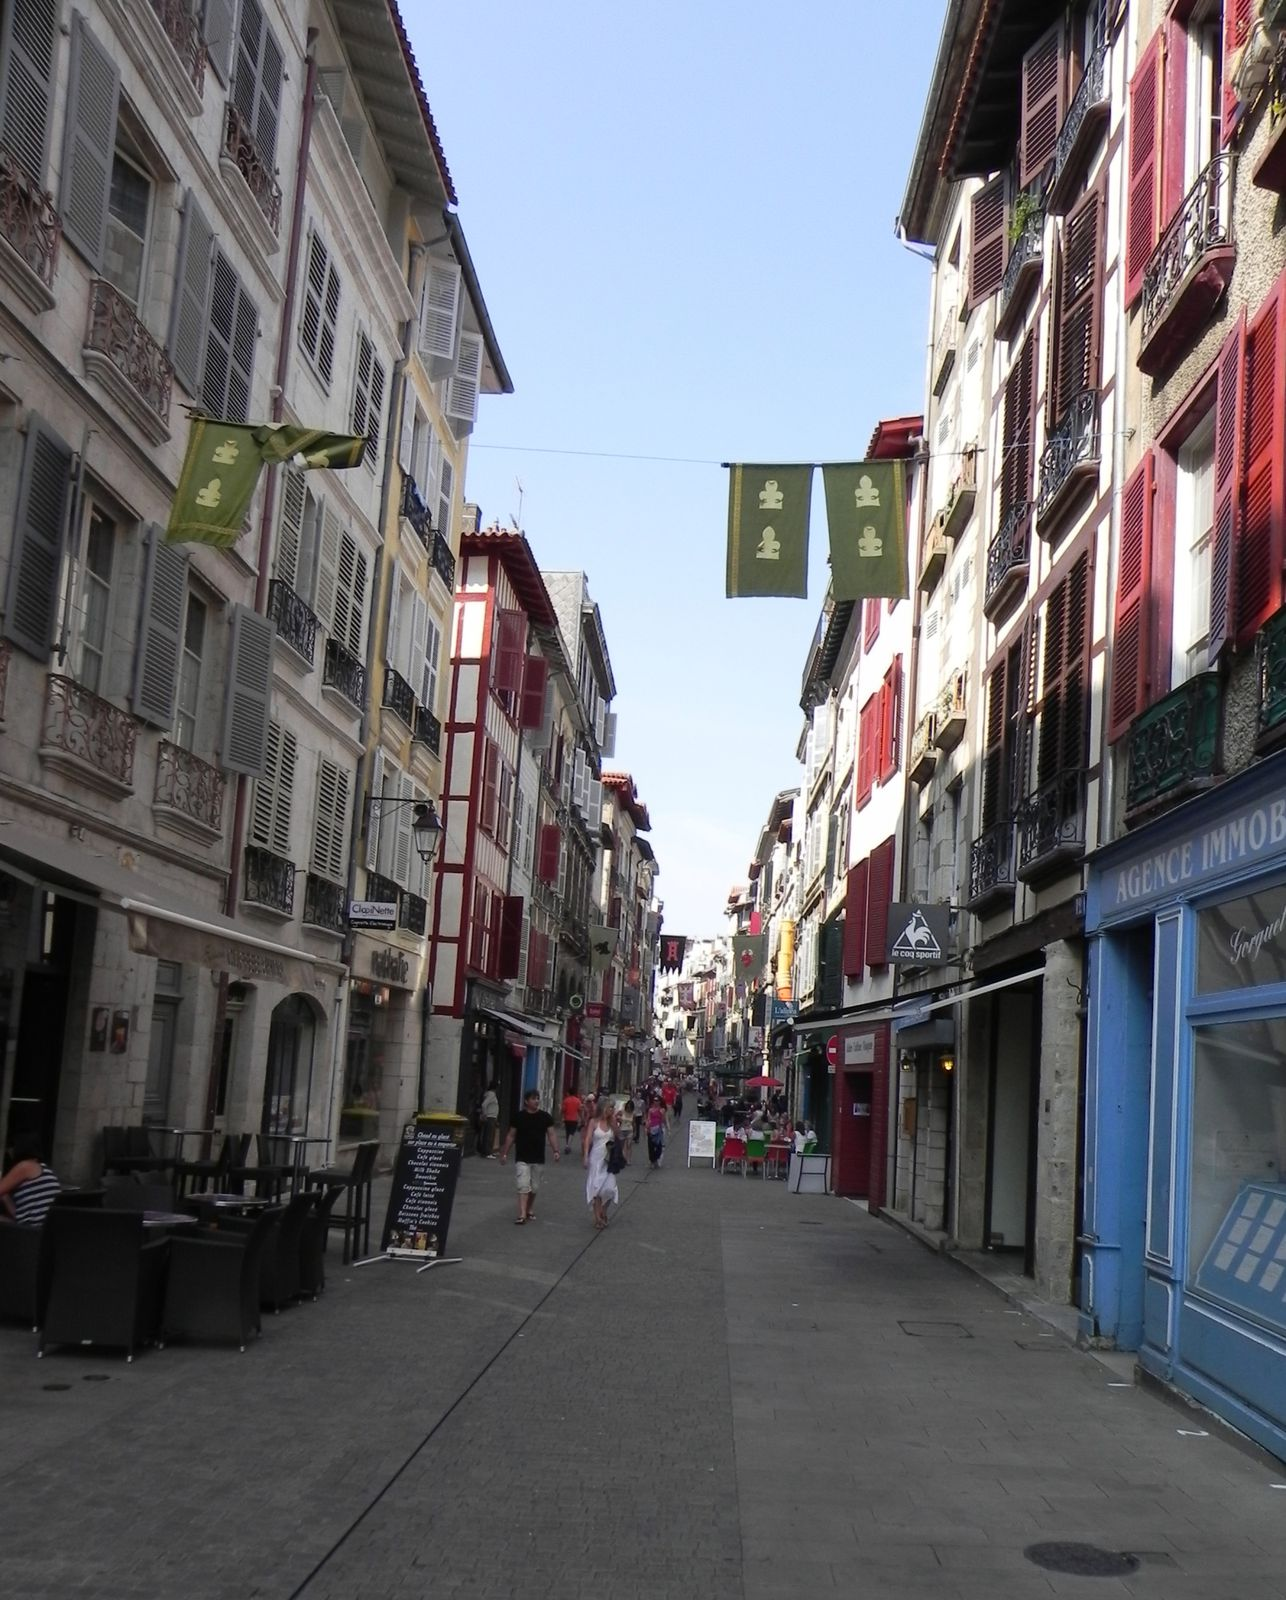 On est reparti en empruntant la rue d'Espagne.